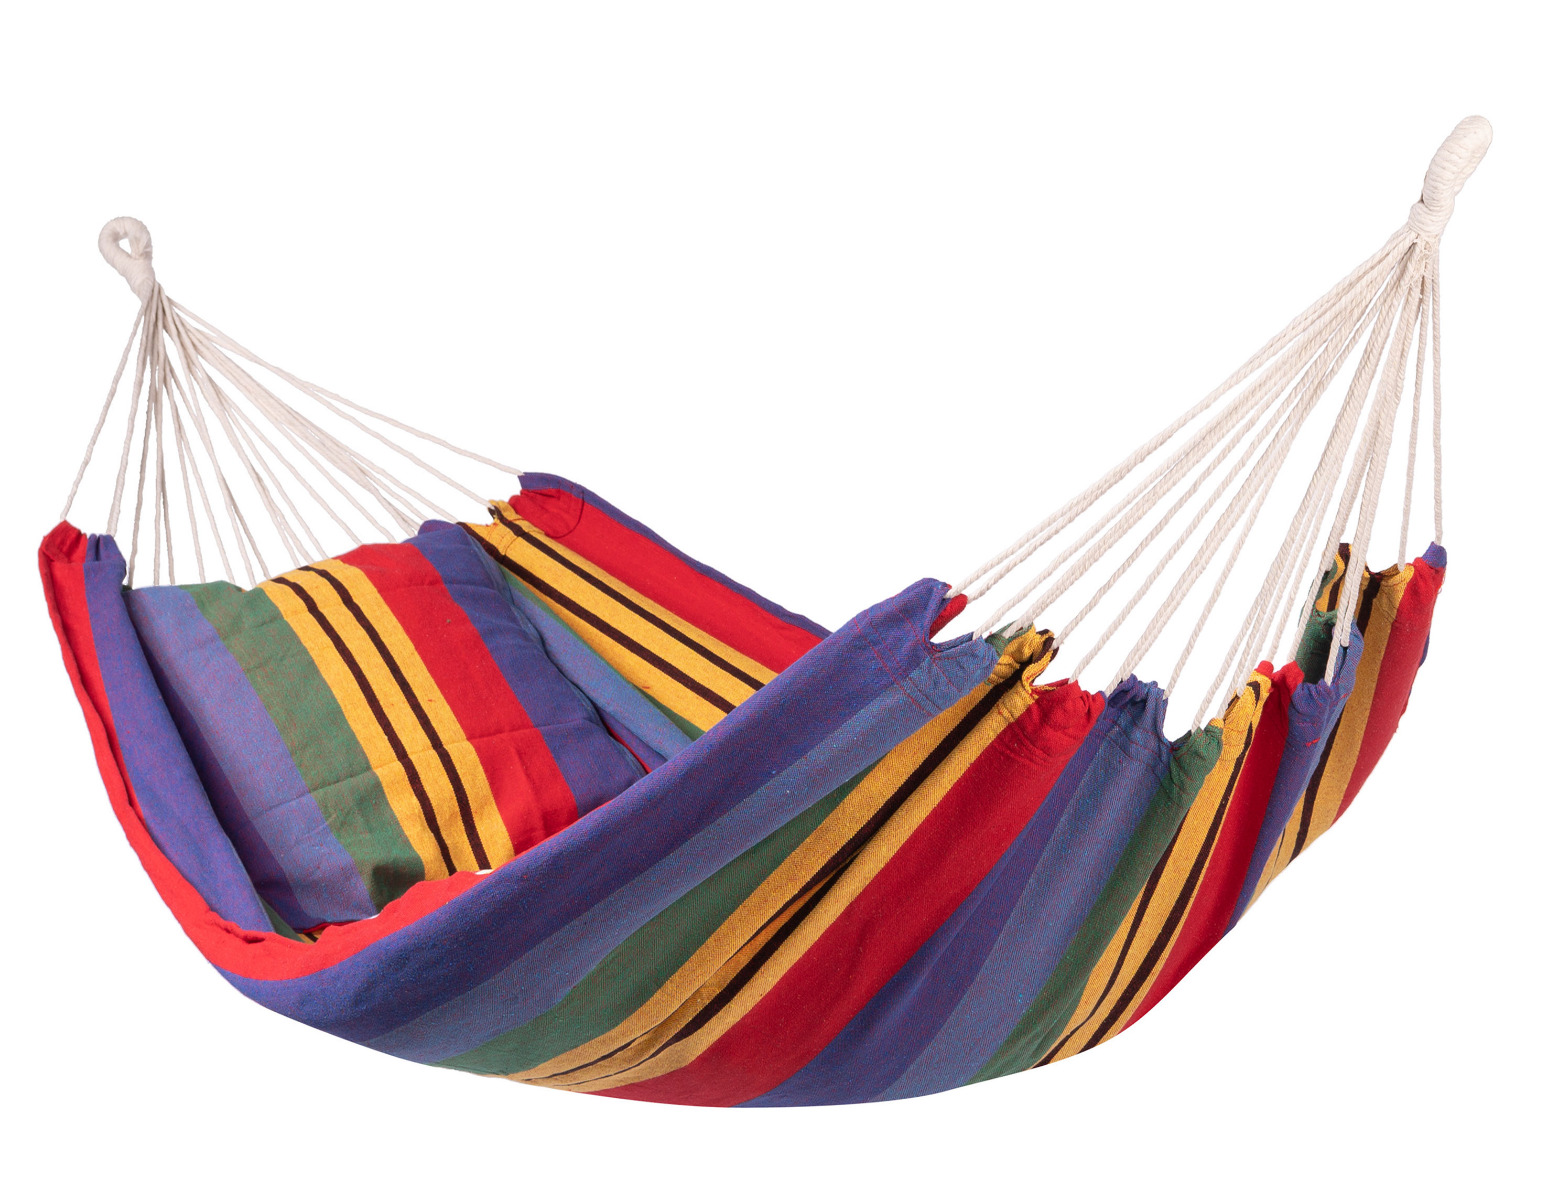 'Ibiza' Single E�npersoons Hangmat - Veelkleurig - 123 Hammock